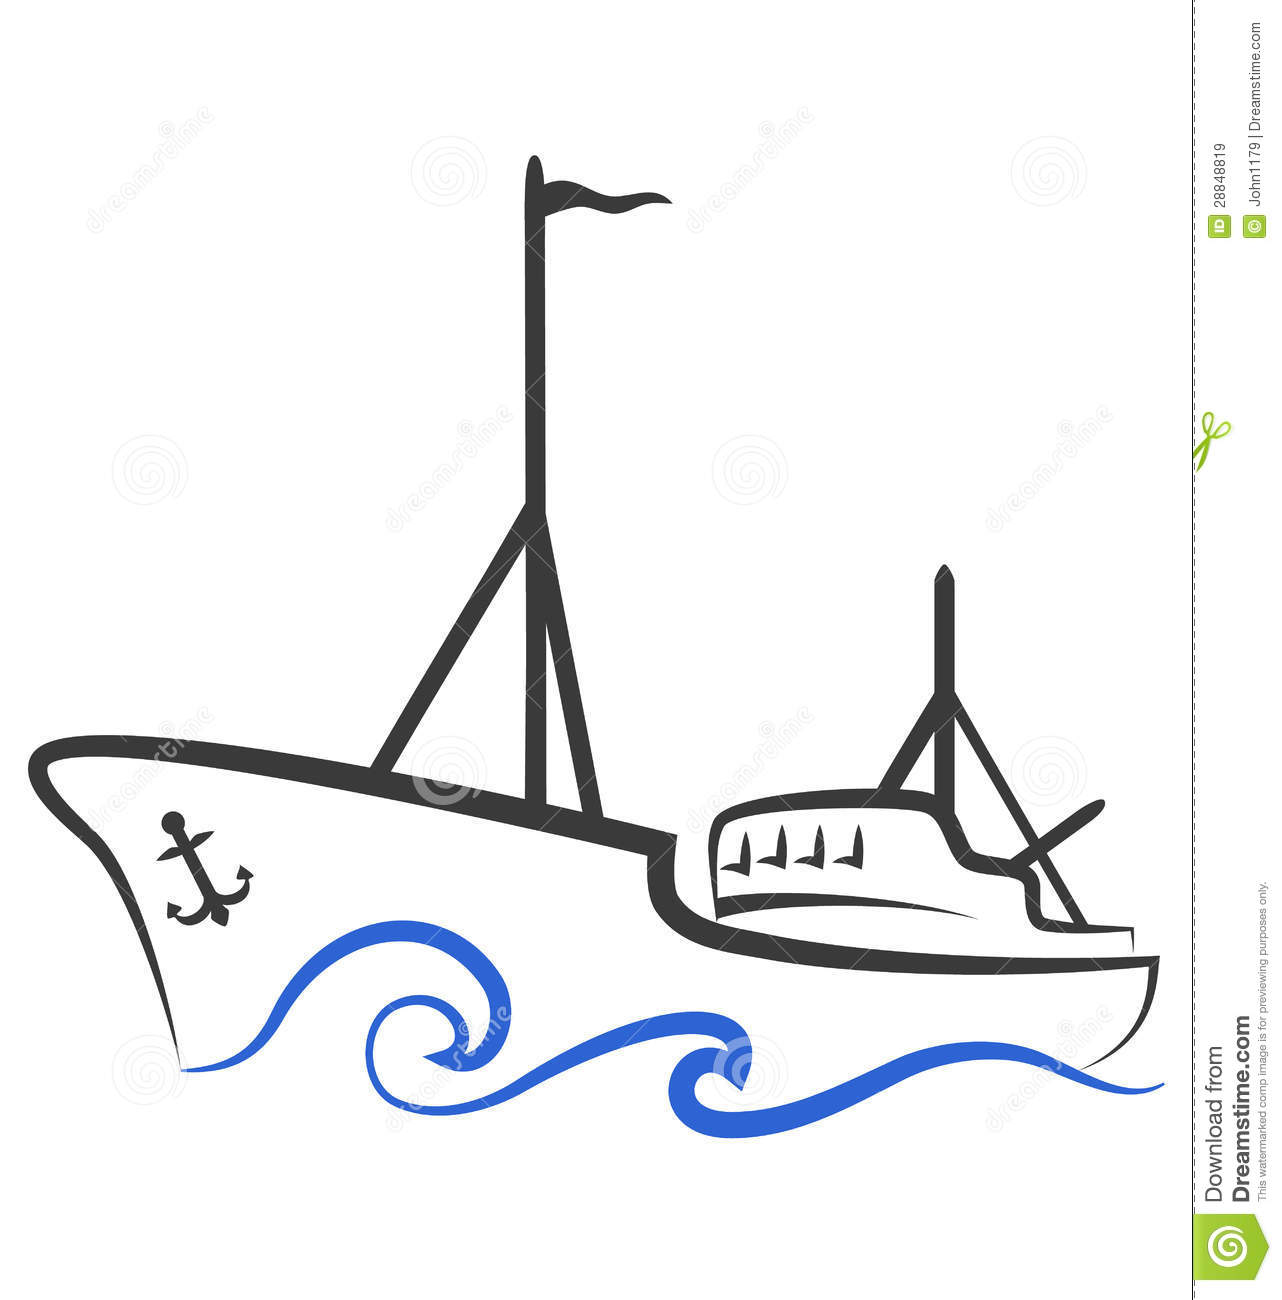 логотип для моторной лодки